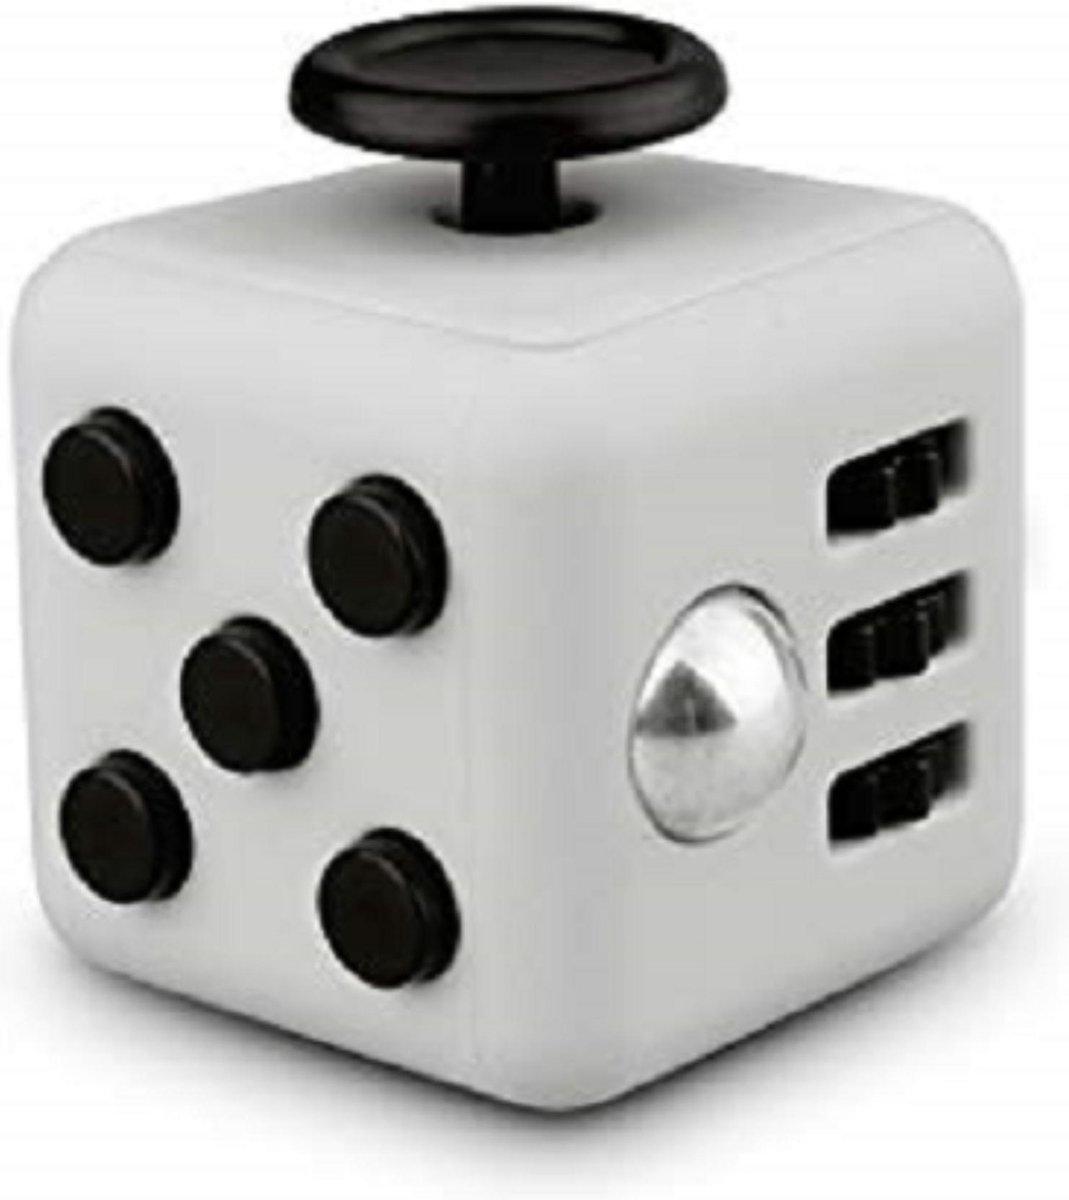 Fidget Cube - Hoogsensiviteit - Anti Stress - Stress - Friemelkubus - Stressbal - Speelgoed - Kubus - Fidget - Cadeau - Zwart